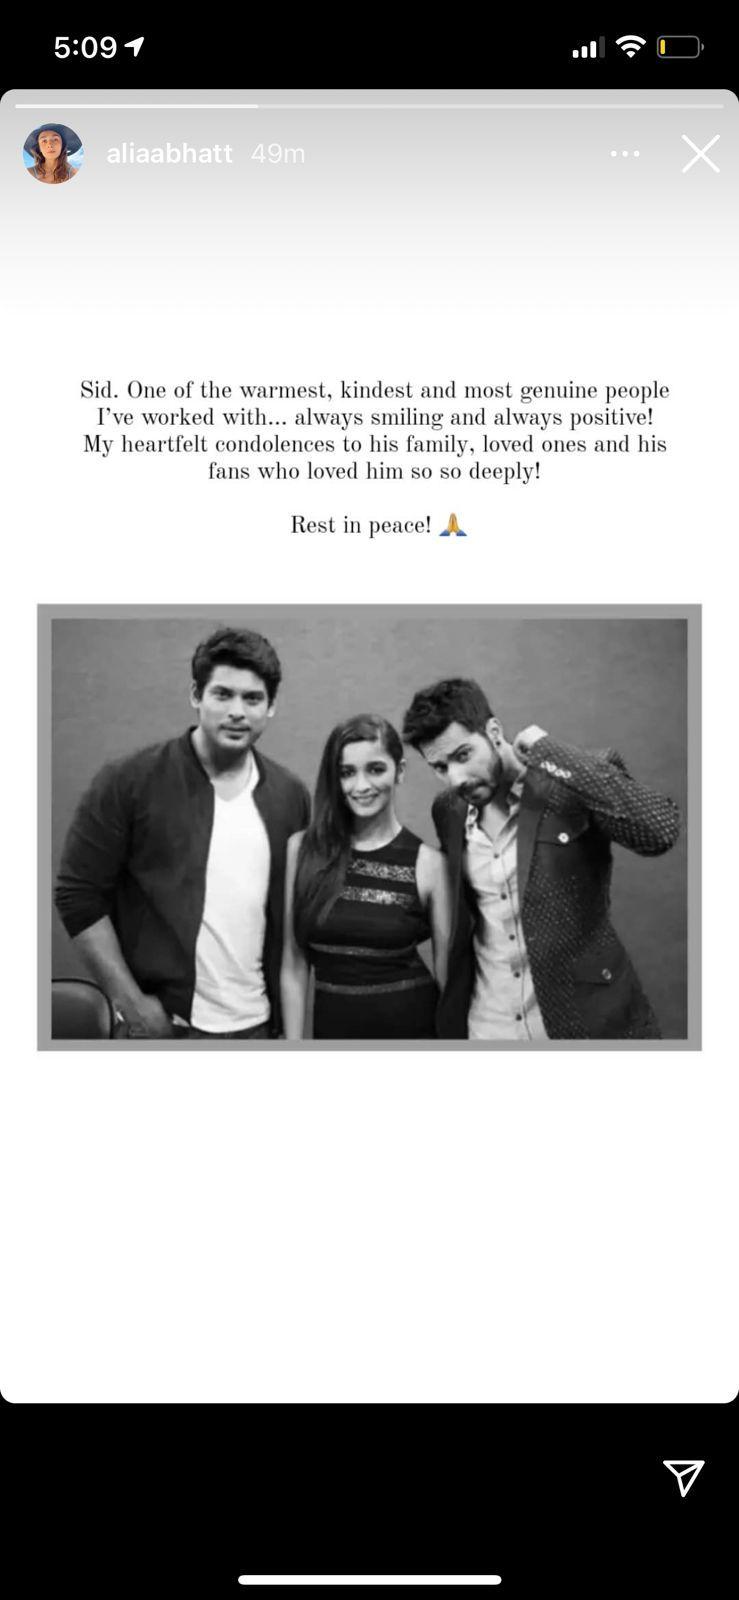 Alia Bhatt Pens Emotional Note For Sidharth Shukla: He Was Warmest, Kindest, Most Genuine